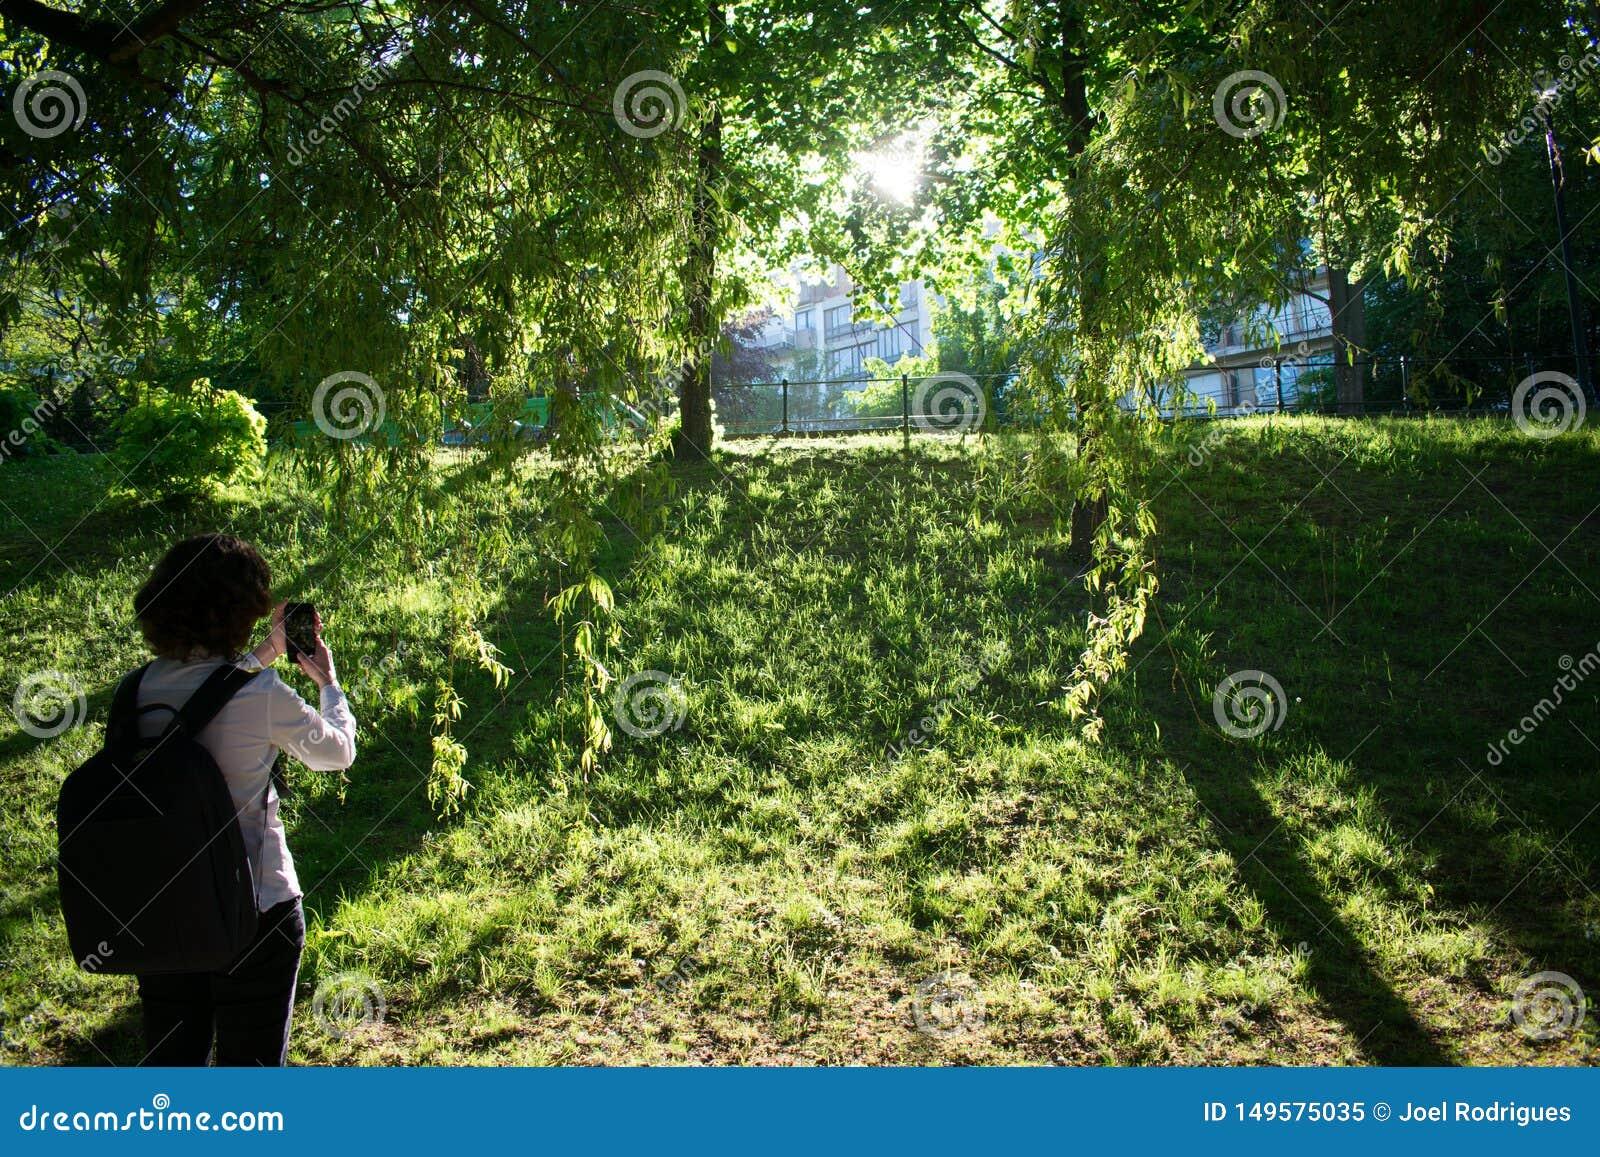 Wideshot της γυναίκας που παίρνει ένα snpashot του ηλιοβασιλέματος στο πάρκο